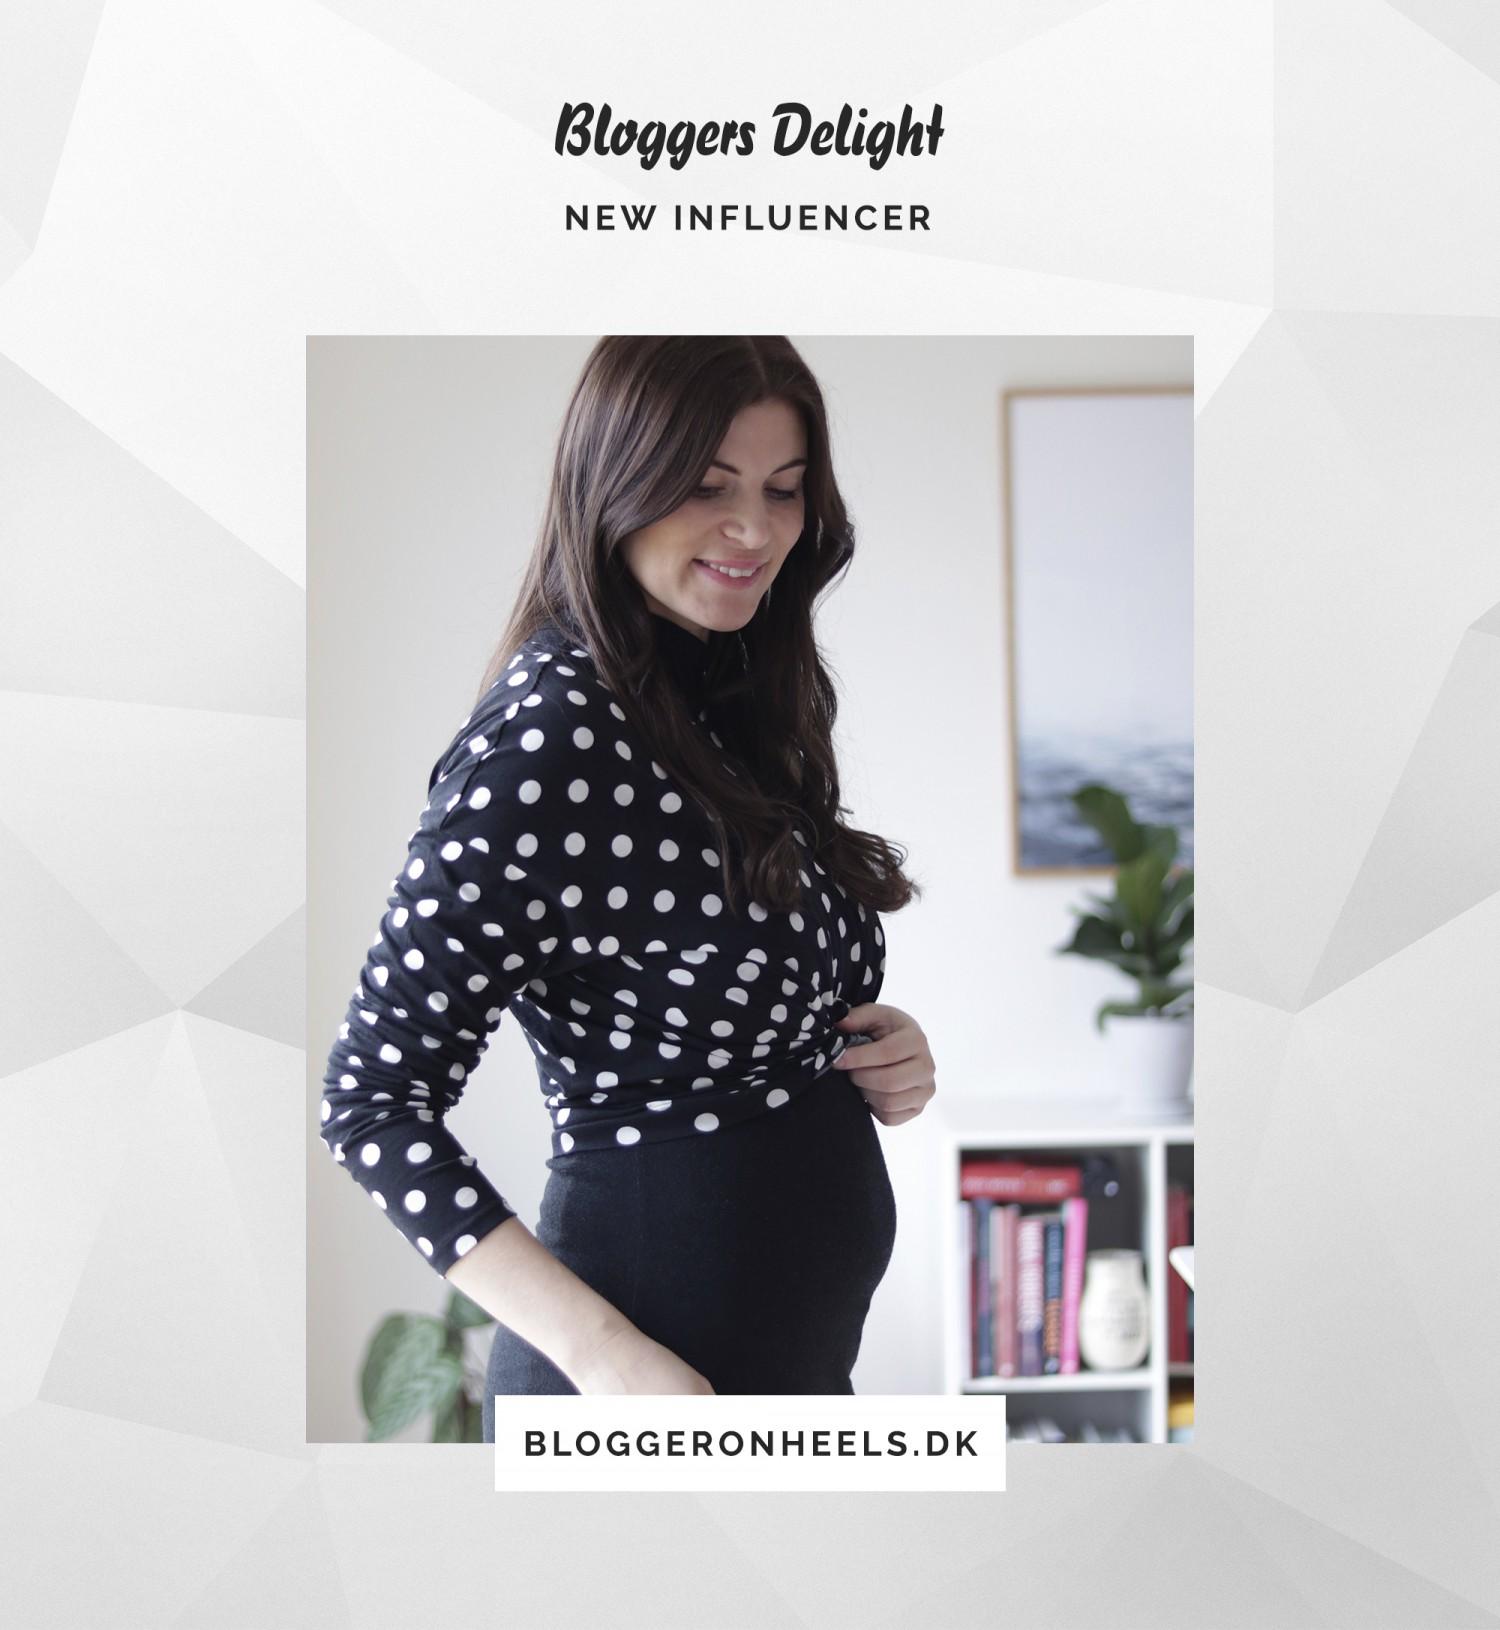 bloggeronheels